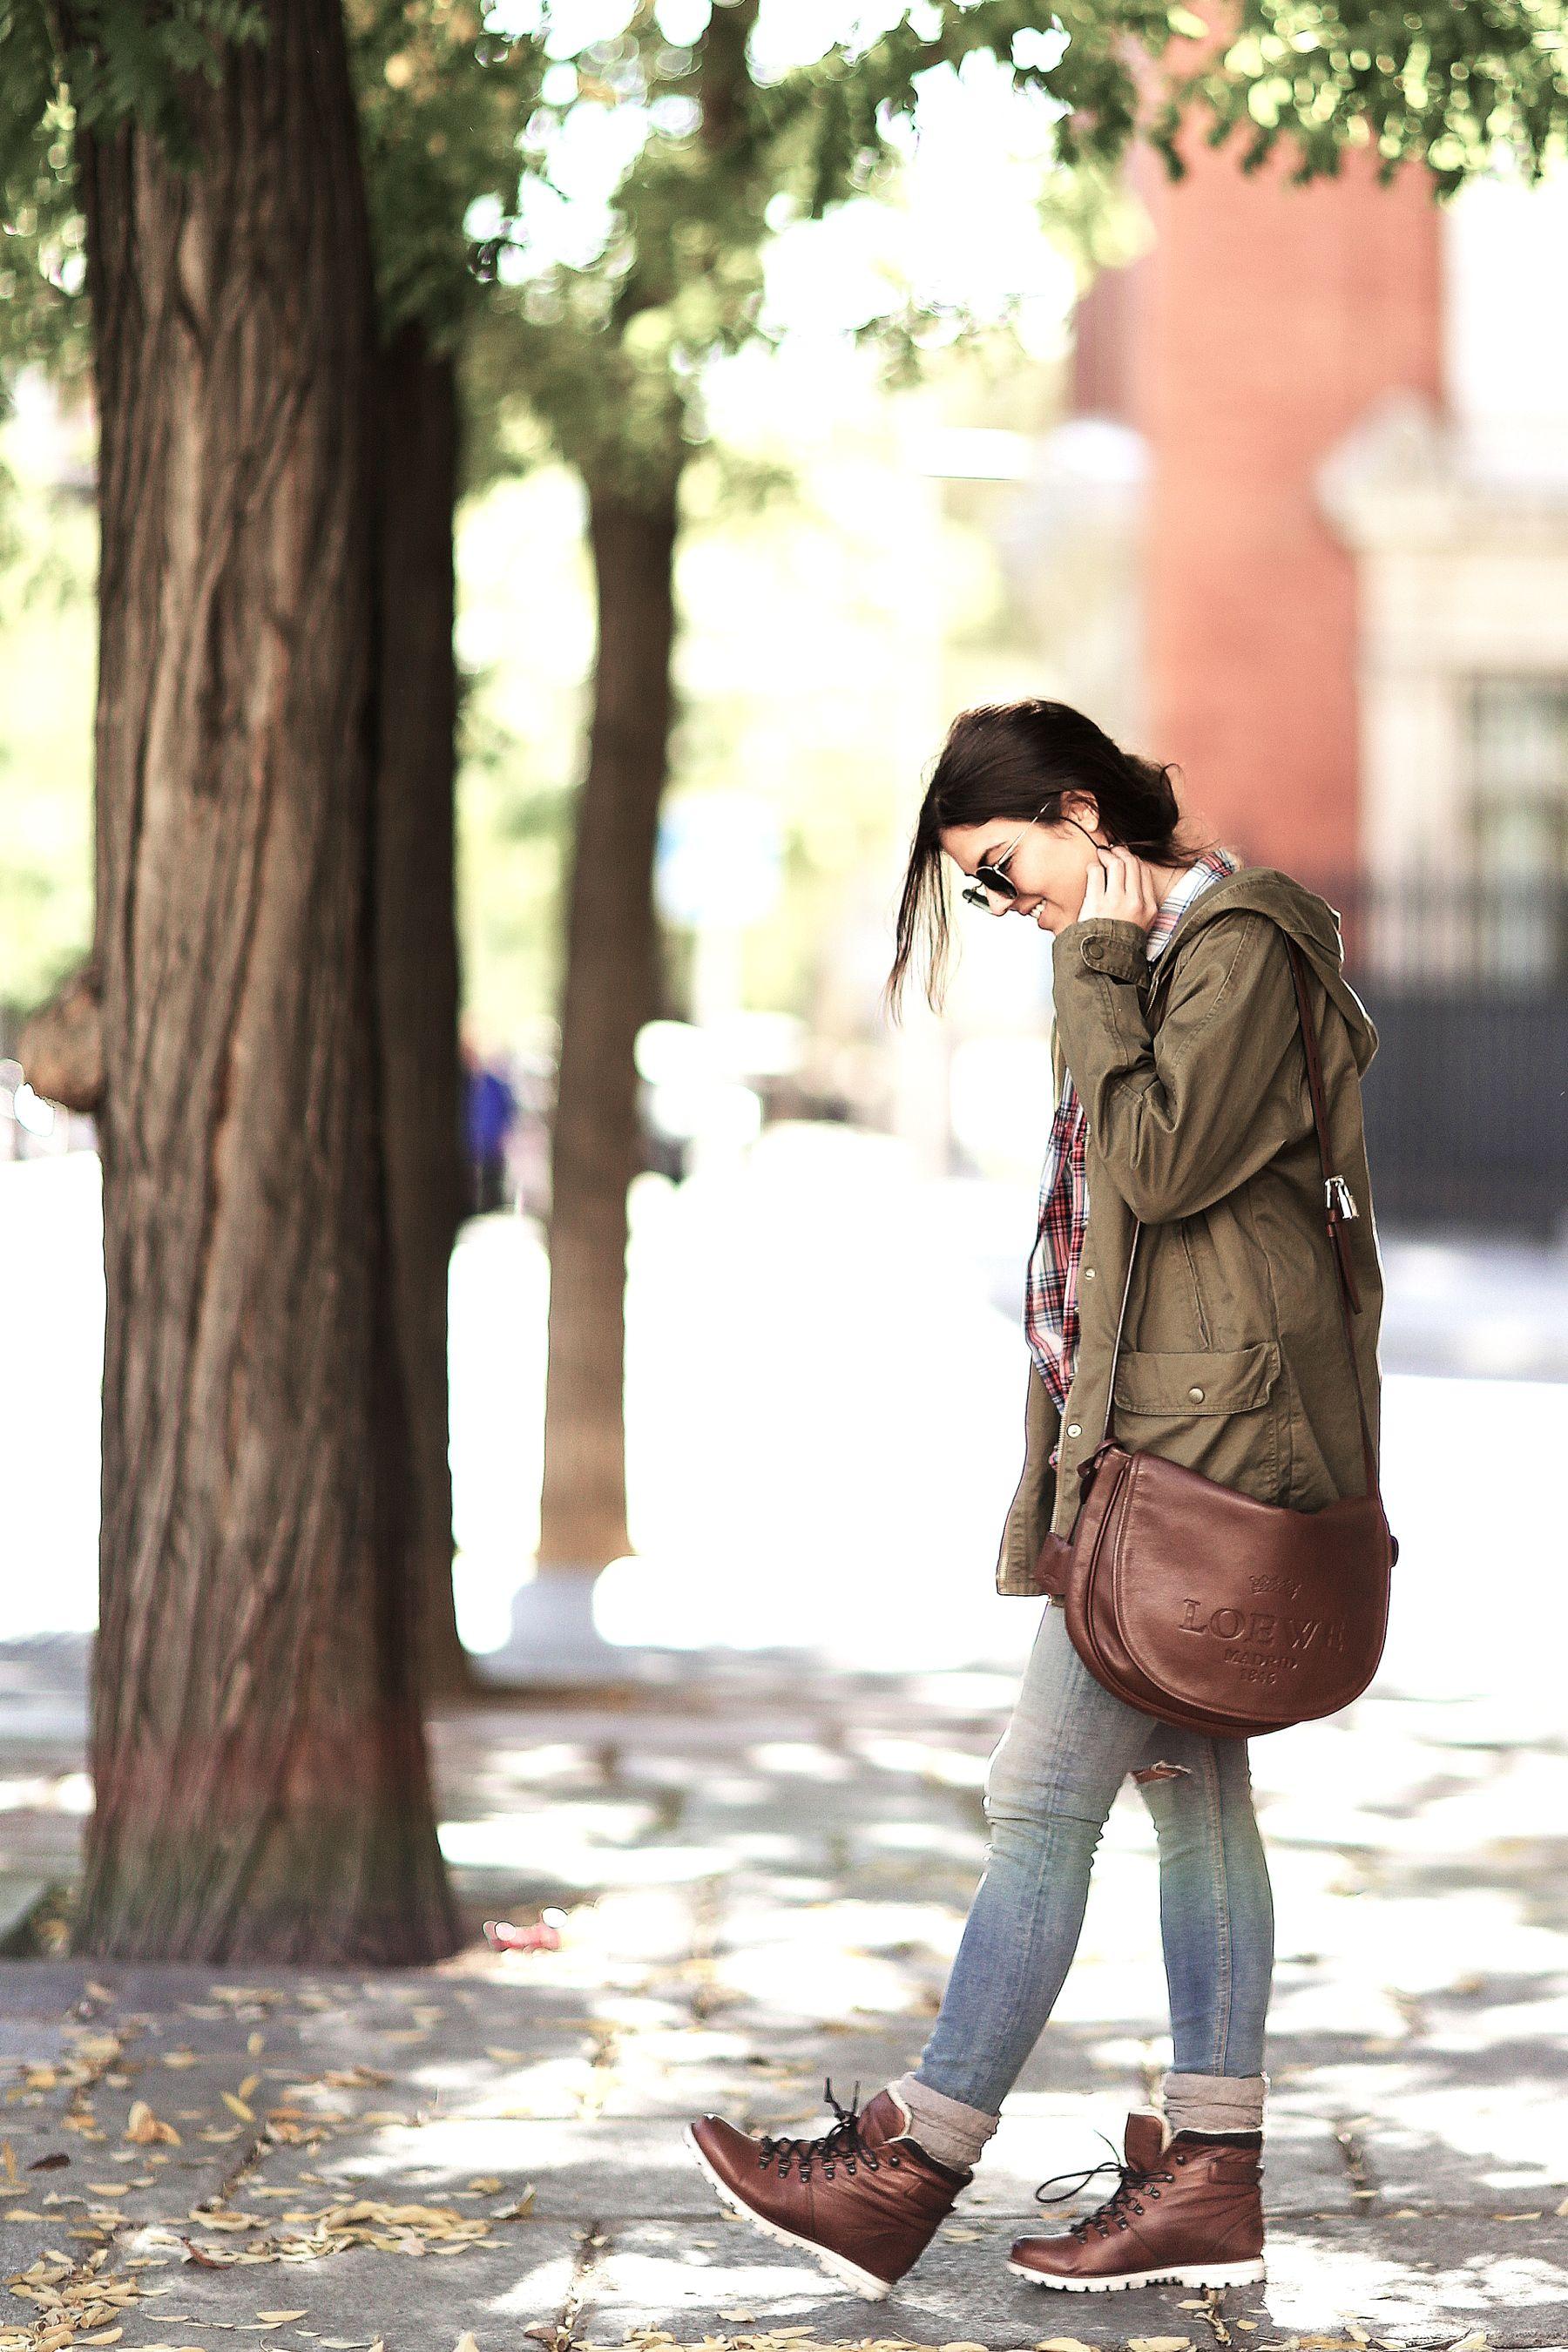 trendy-taste-look-outfit-street-style-trekking-tendencia-botas-parka-camisa-cuadros-plaid-shirt-fall-otoño-3